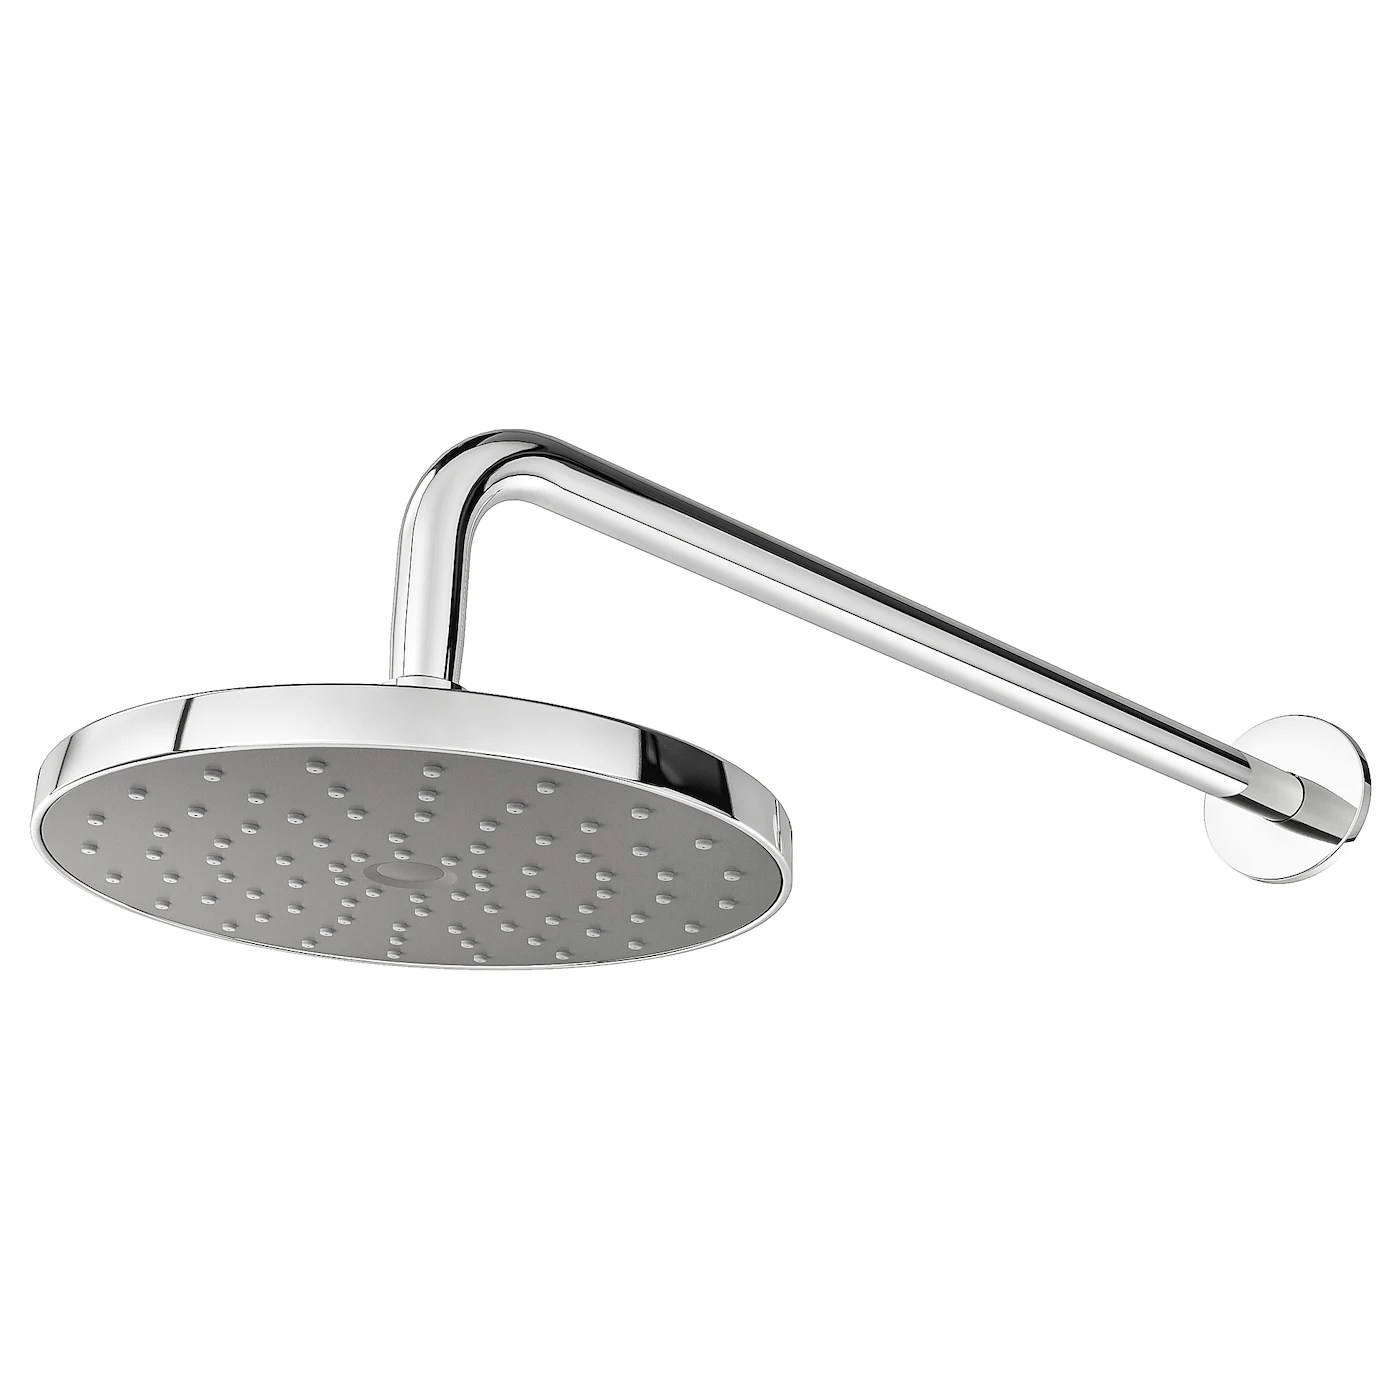 brogrund 1 spray showerhead with arm chrome plated